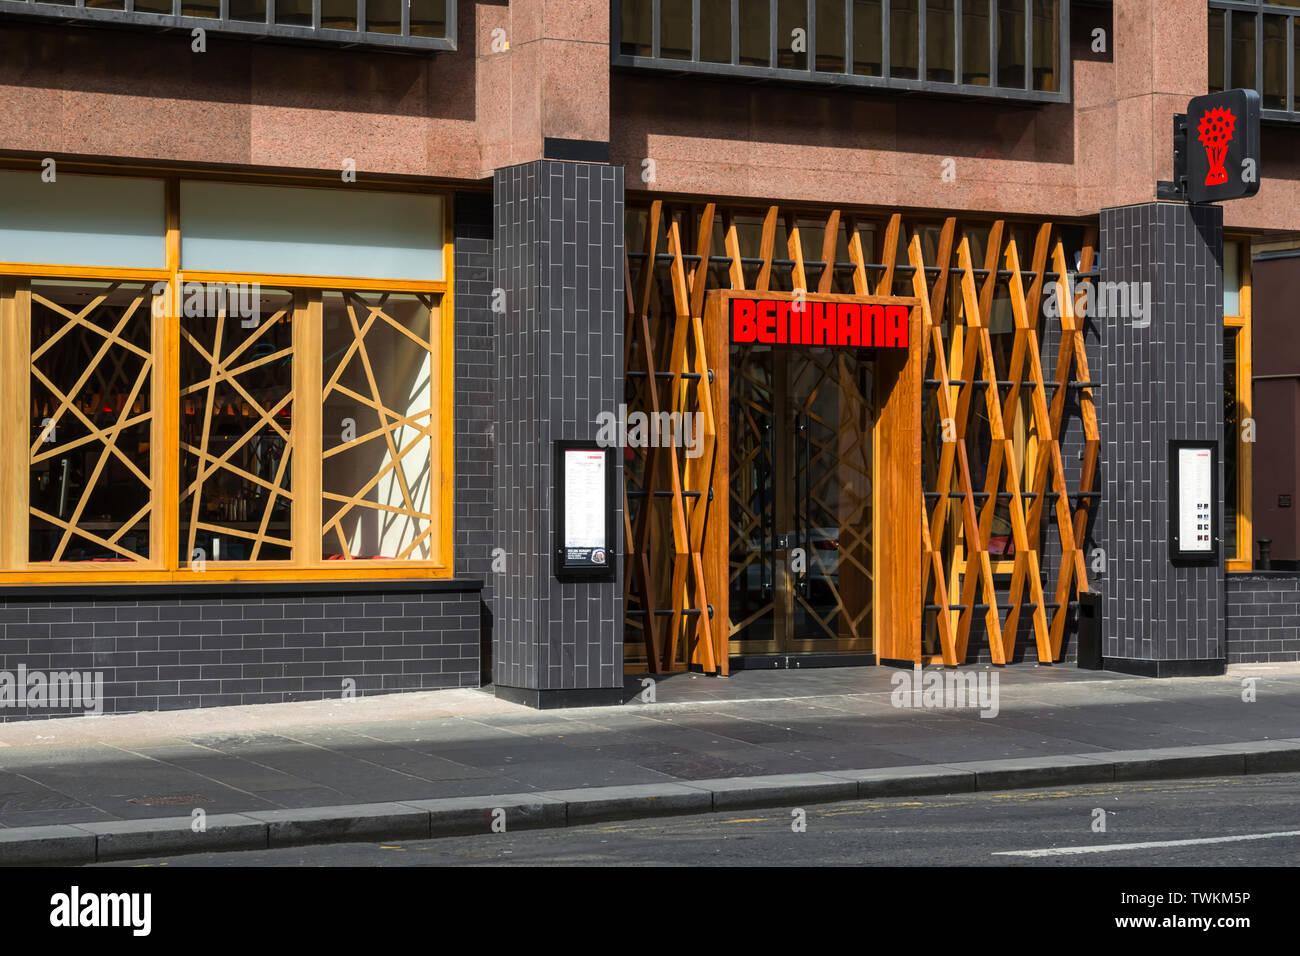 Benihana Japanese Restaurant on West Nile Street in Glasgow city centre, Scotland, UK - Stock Image